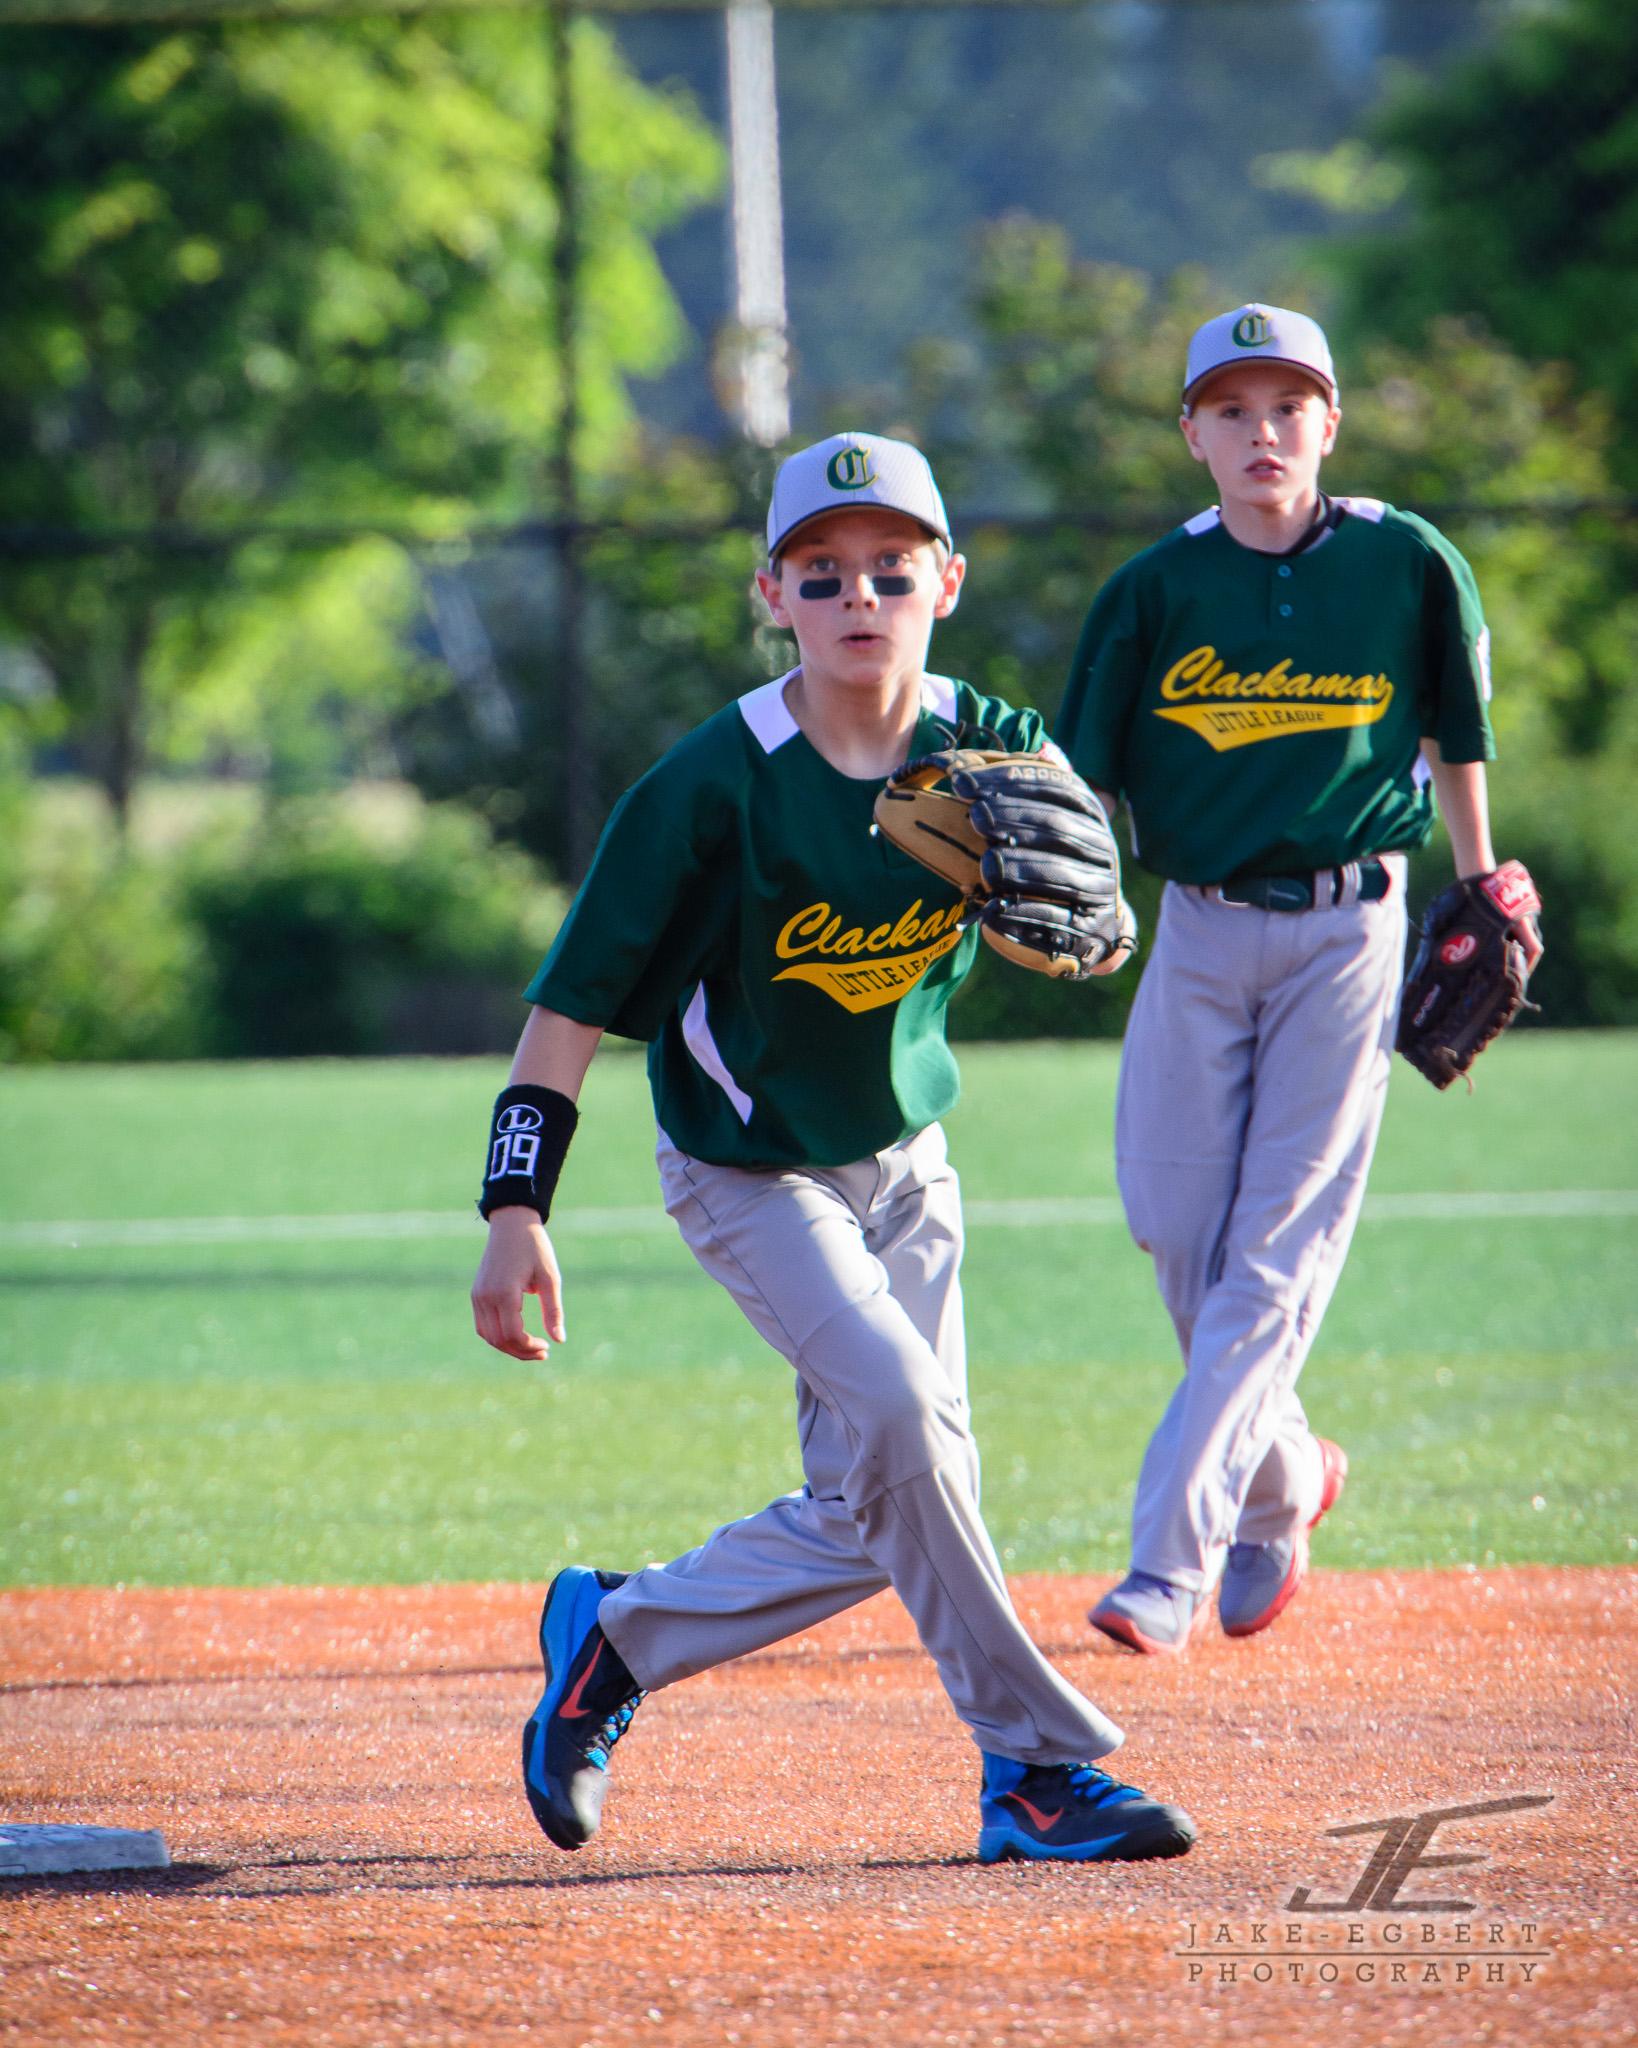 2014-05-17 - Clackamas Invitational Tournament - CLL Majors Green Sox vs. Scapoose Tribe